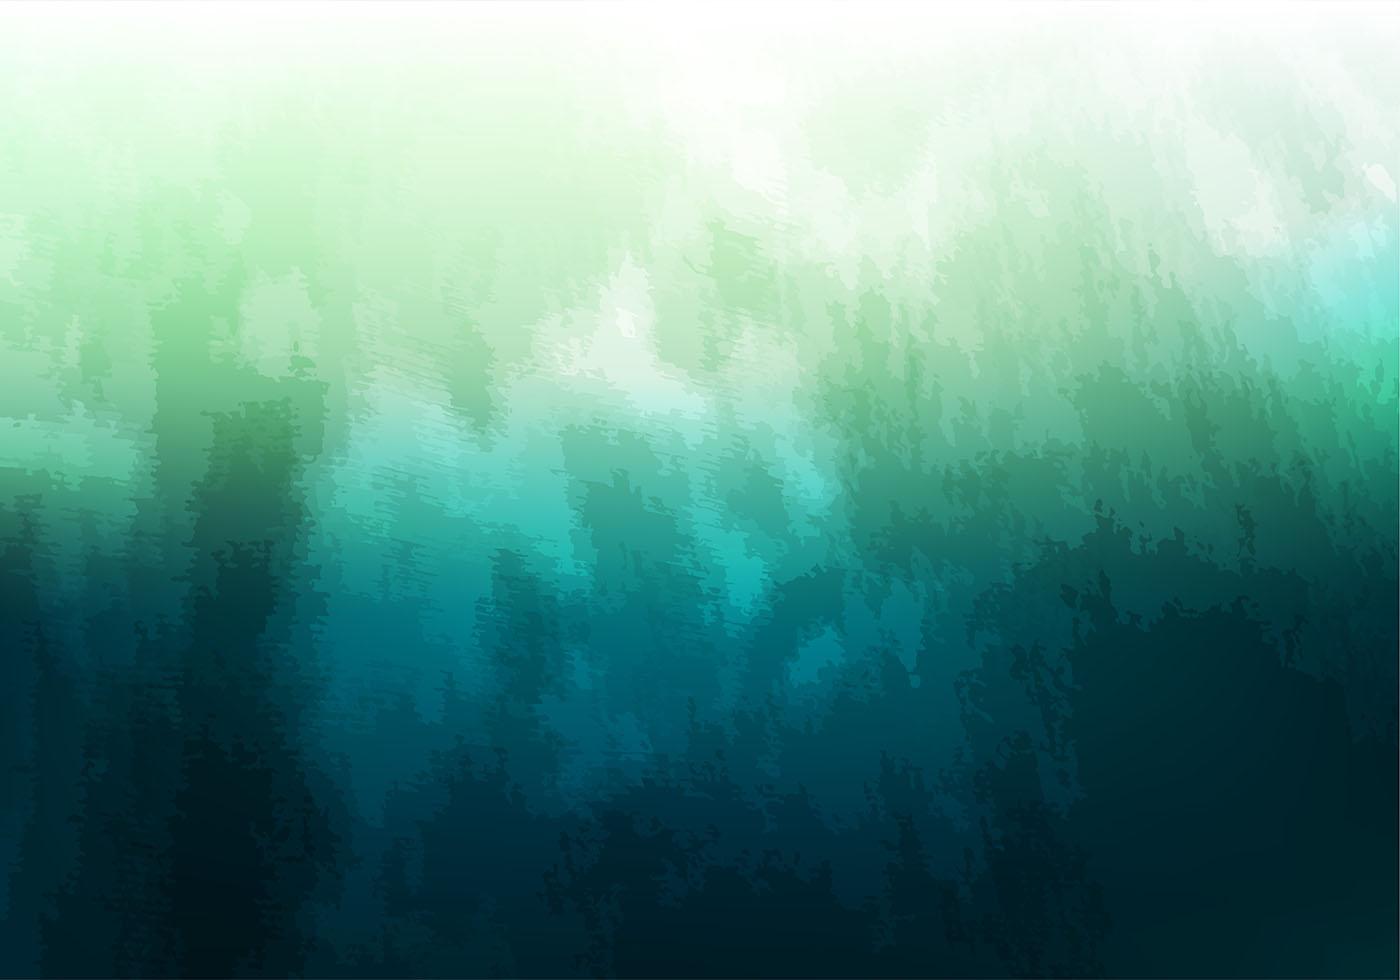 Free Vector Green Watercolor Background - Download Free Vector Art